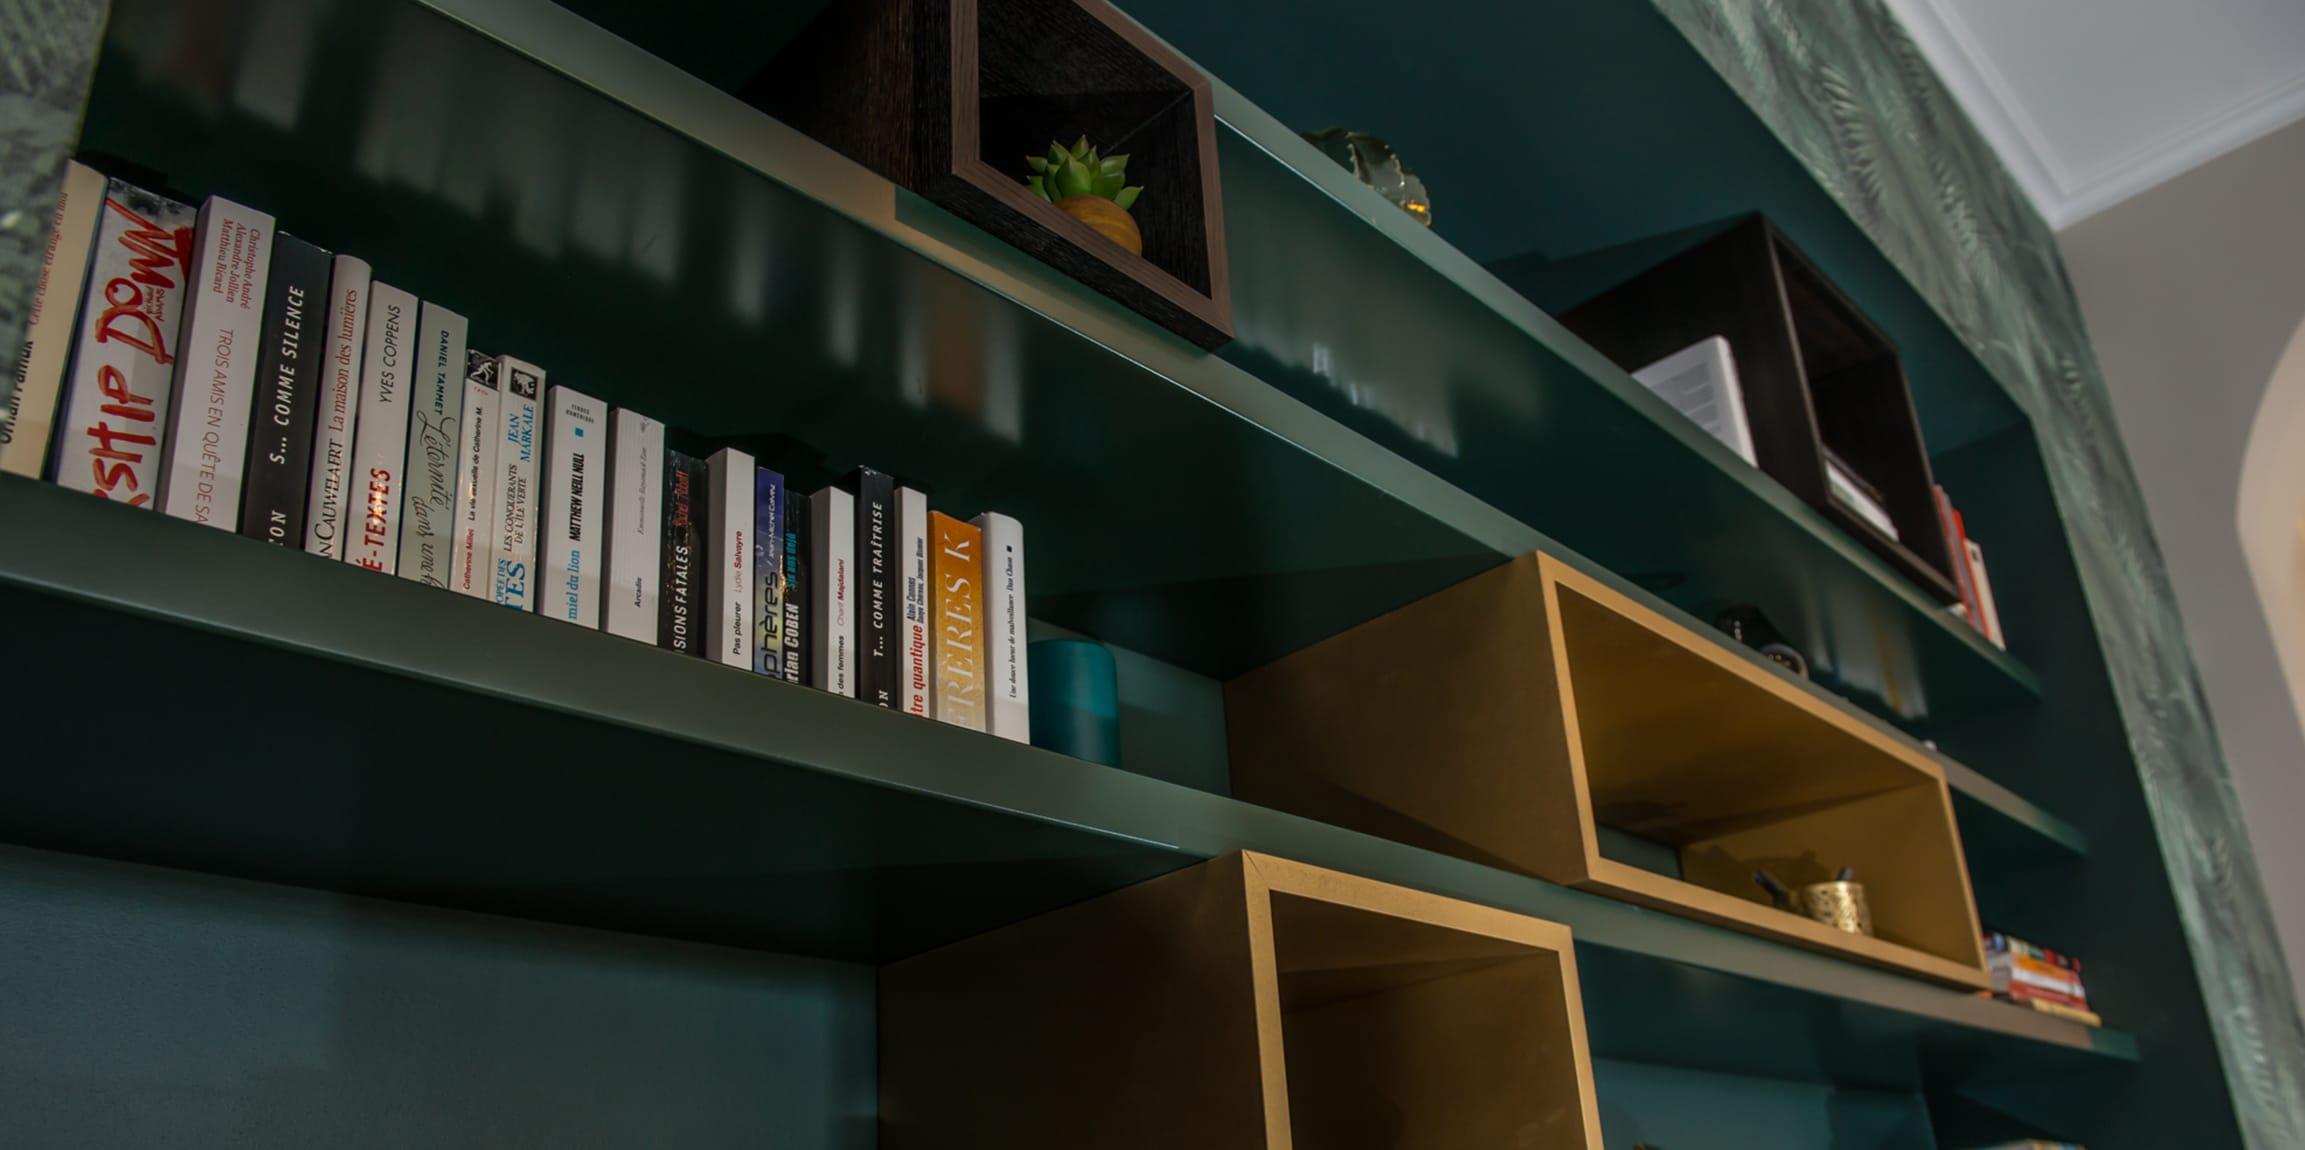 Bibliothèque sur-mesure design